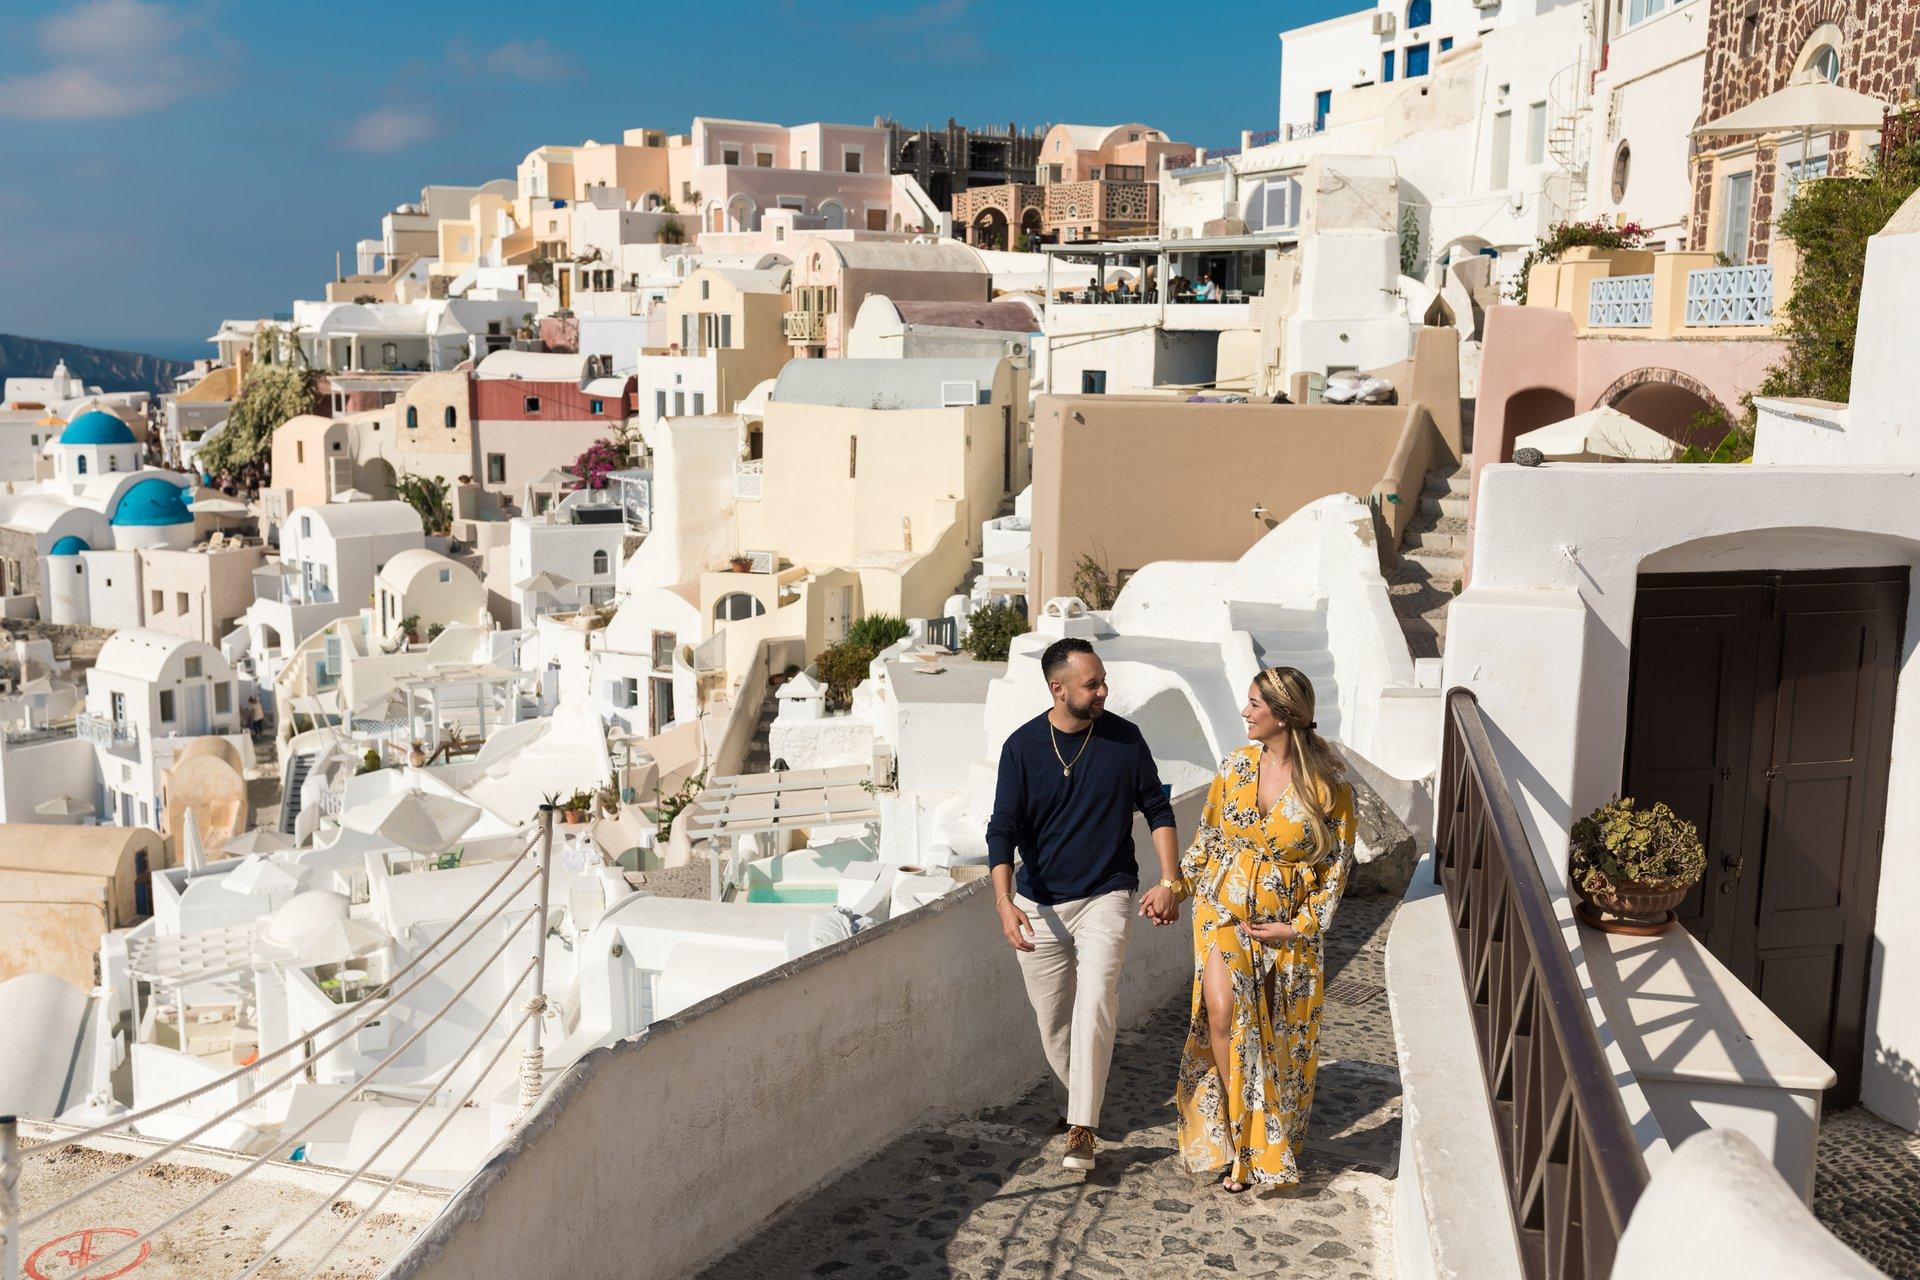 Santorini-Greece-travel-story-Flytographer-14